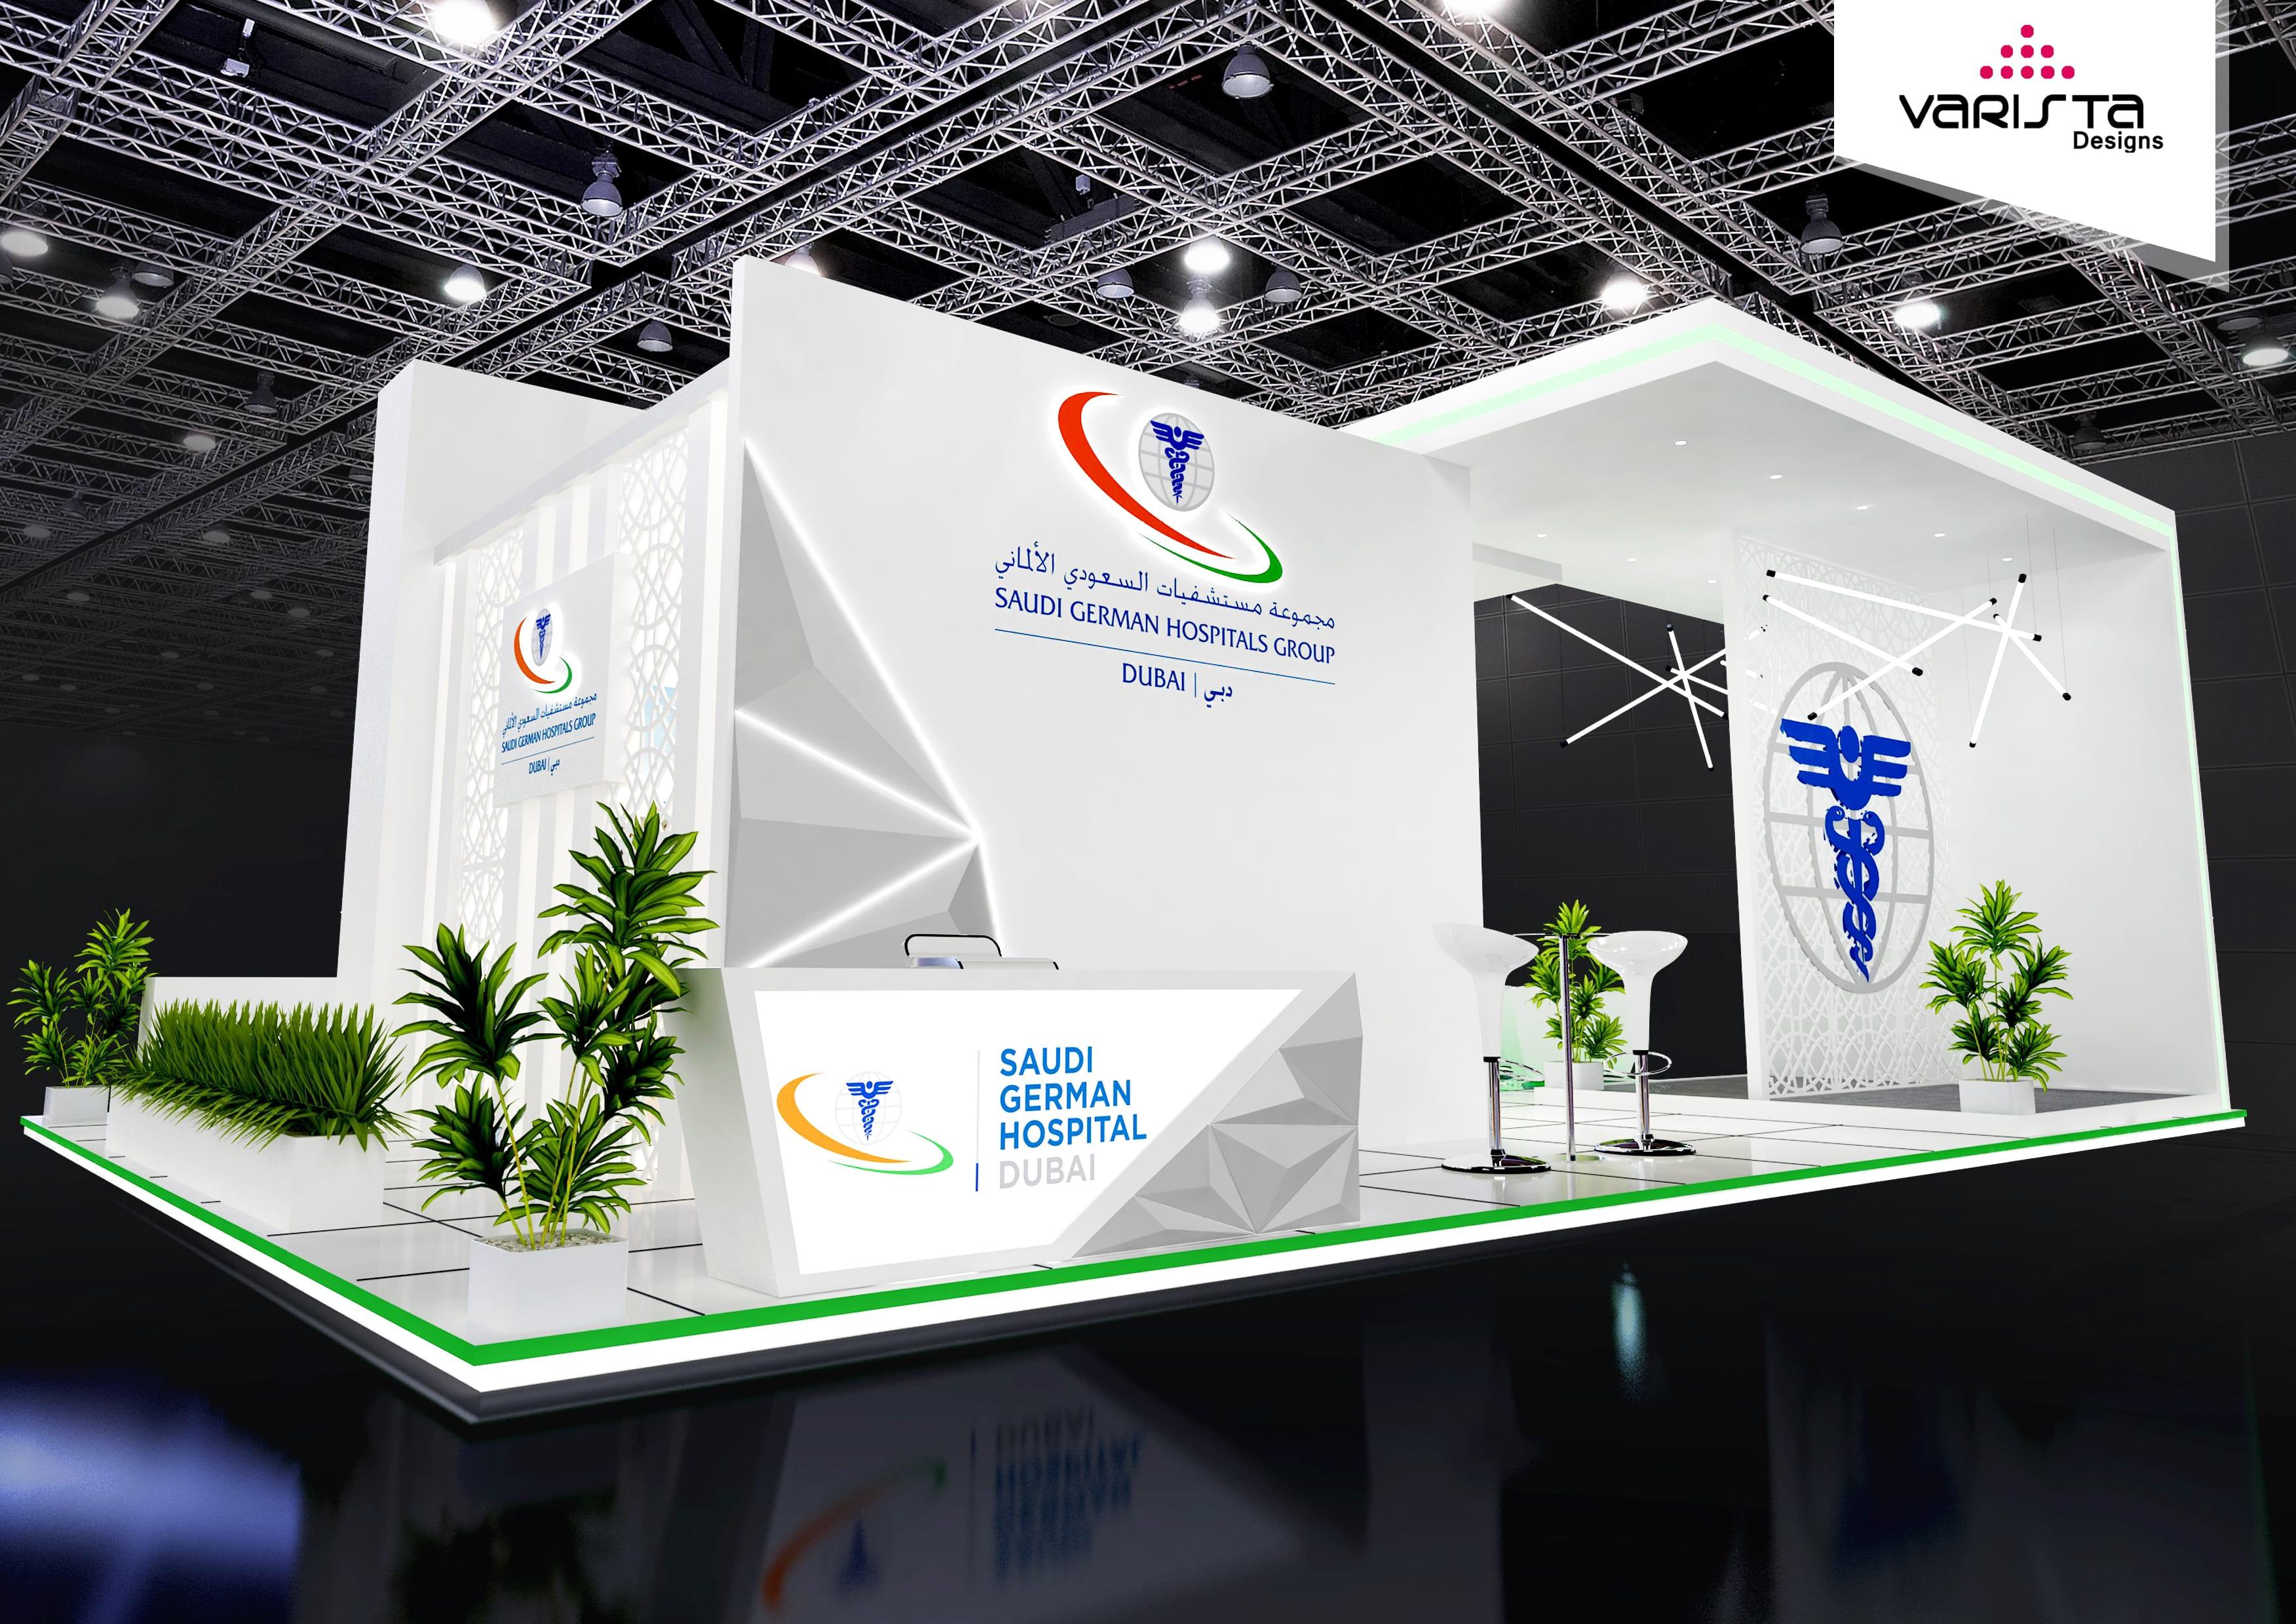 Modern Exhibition Stand Builders : High end exhibition stand designers in dubai varista designs